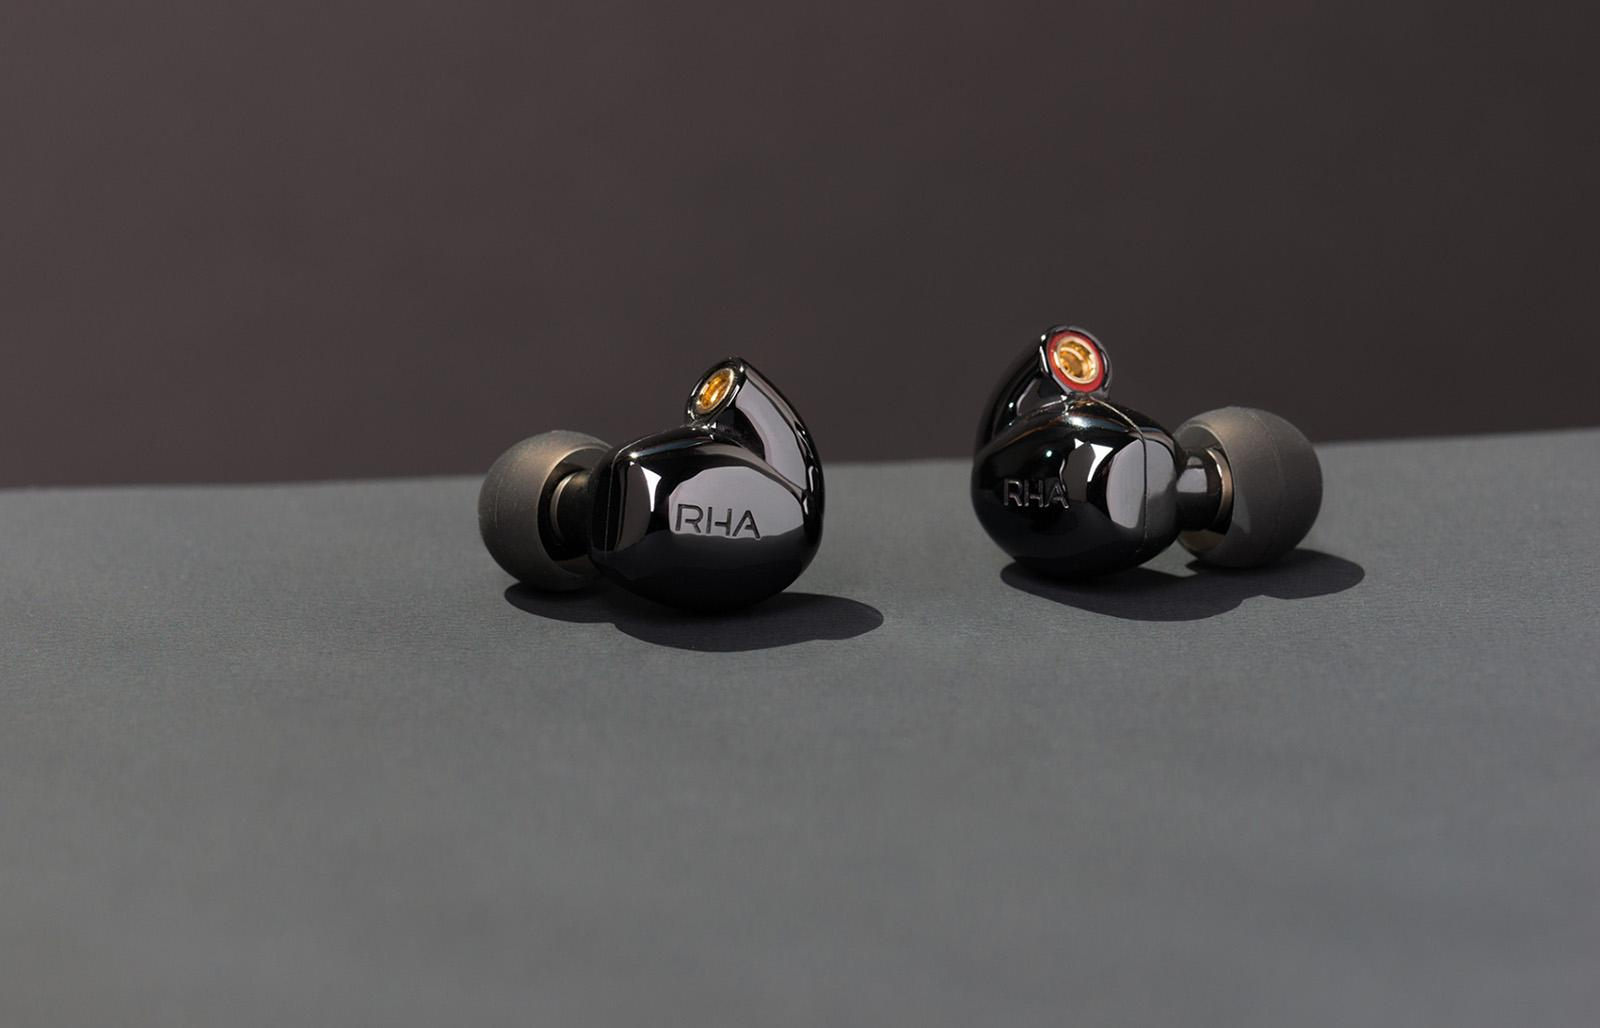 RHA推出全球首款支持以无线连接的平板单元耳机